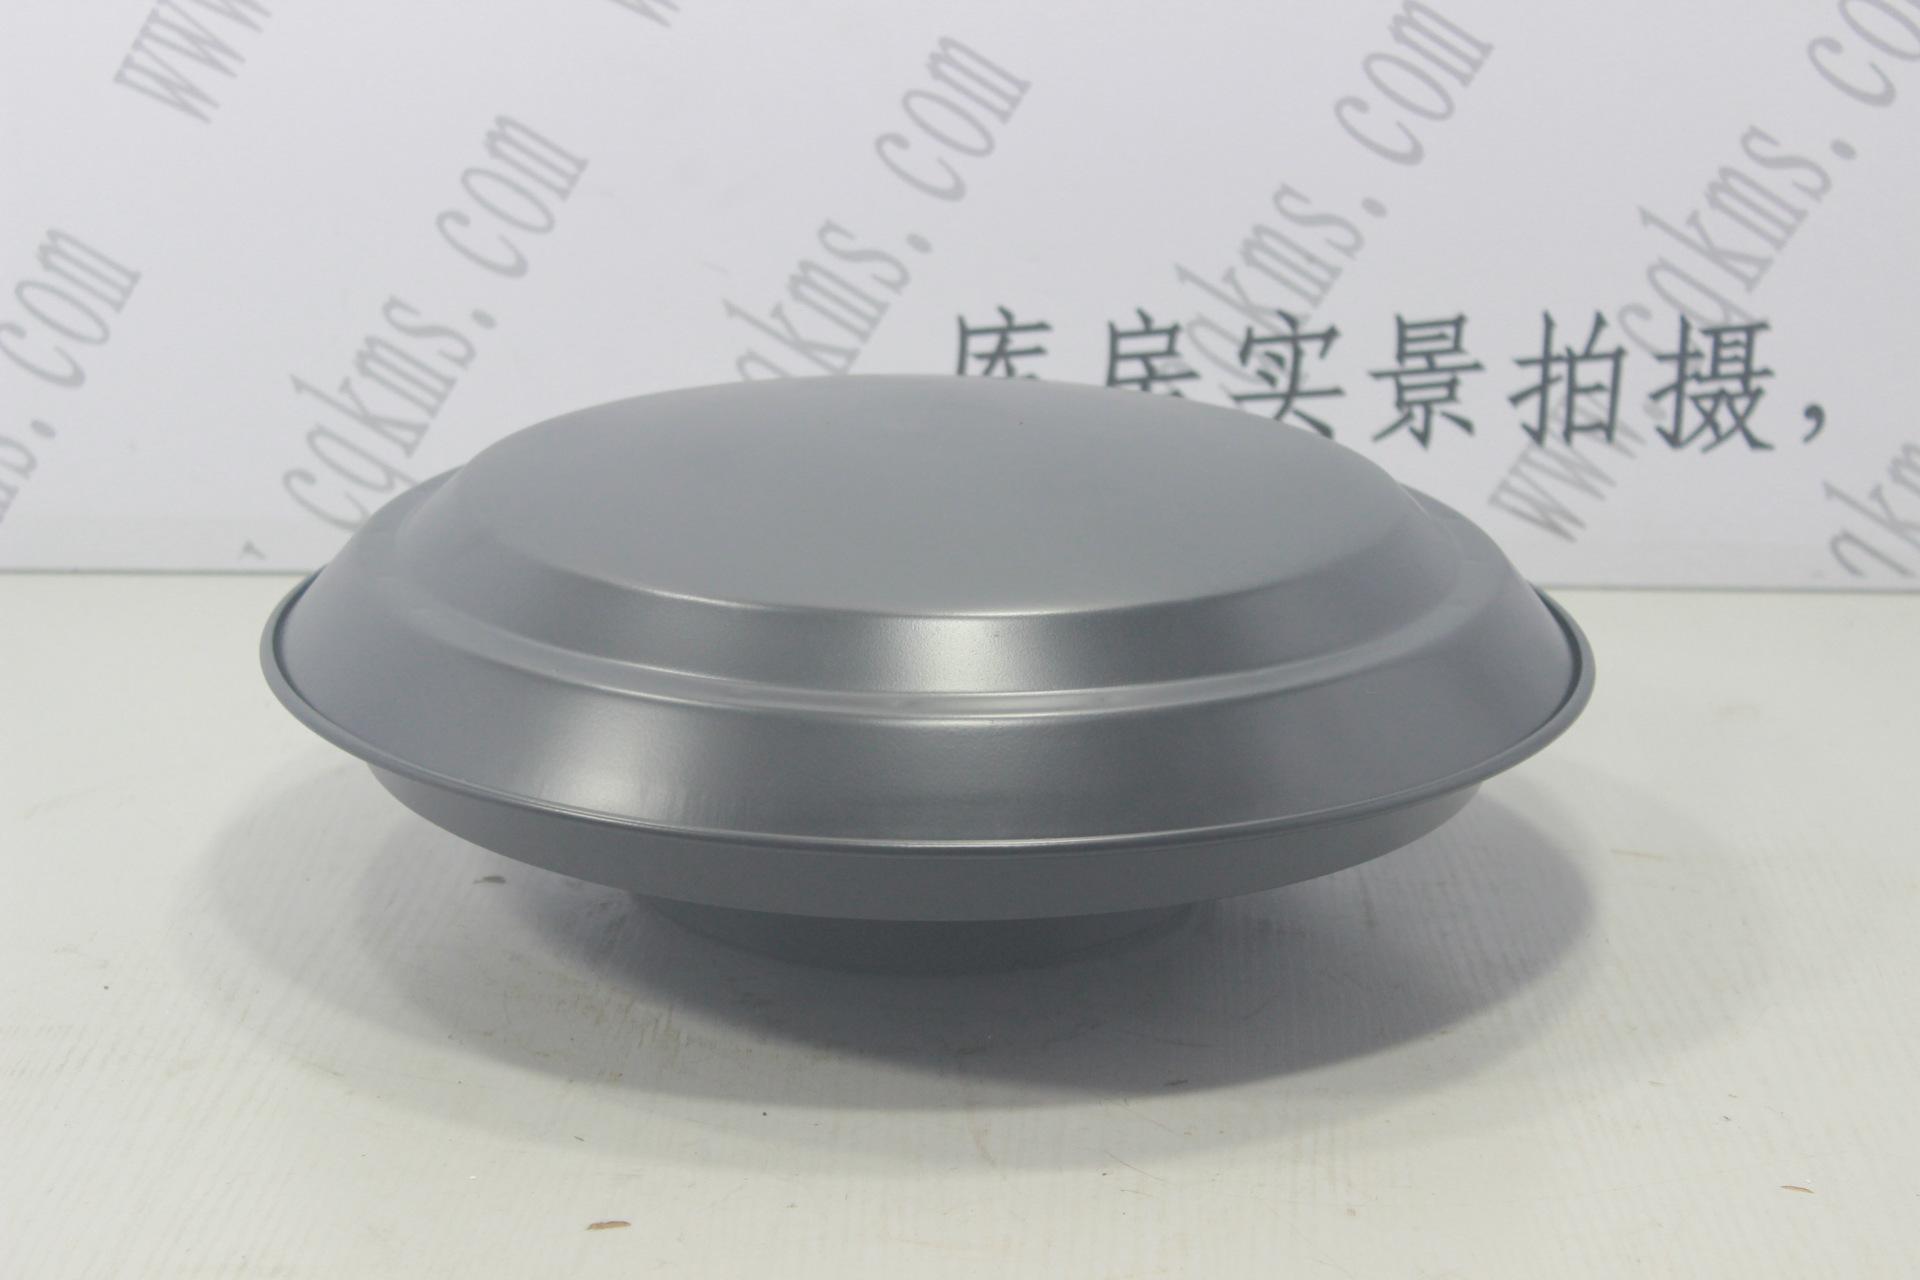 kms01241-3002138-增压器罩----参考重量500-500图片1